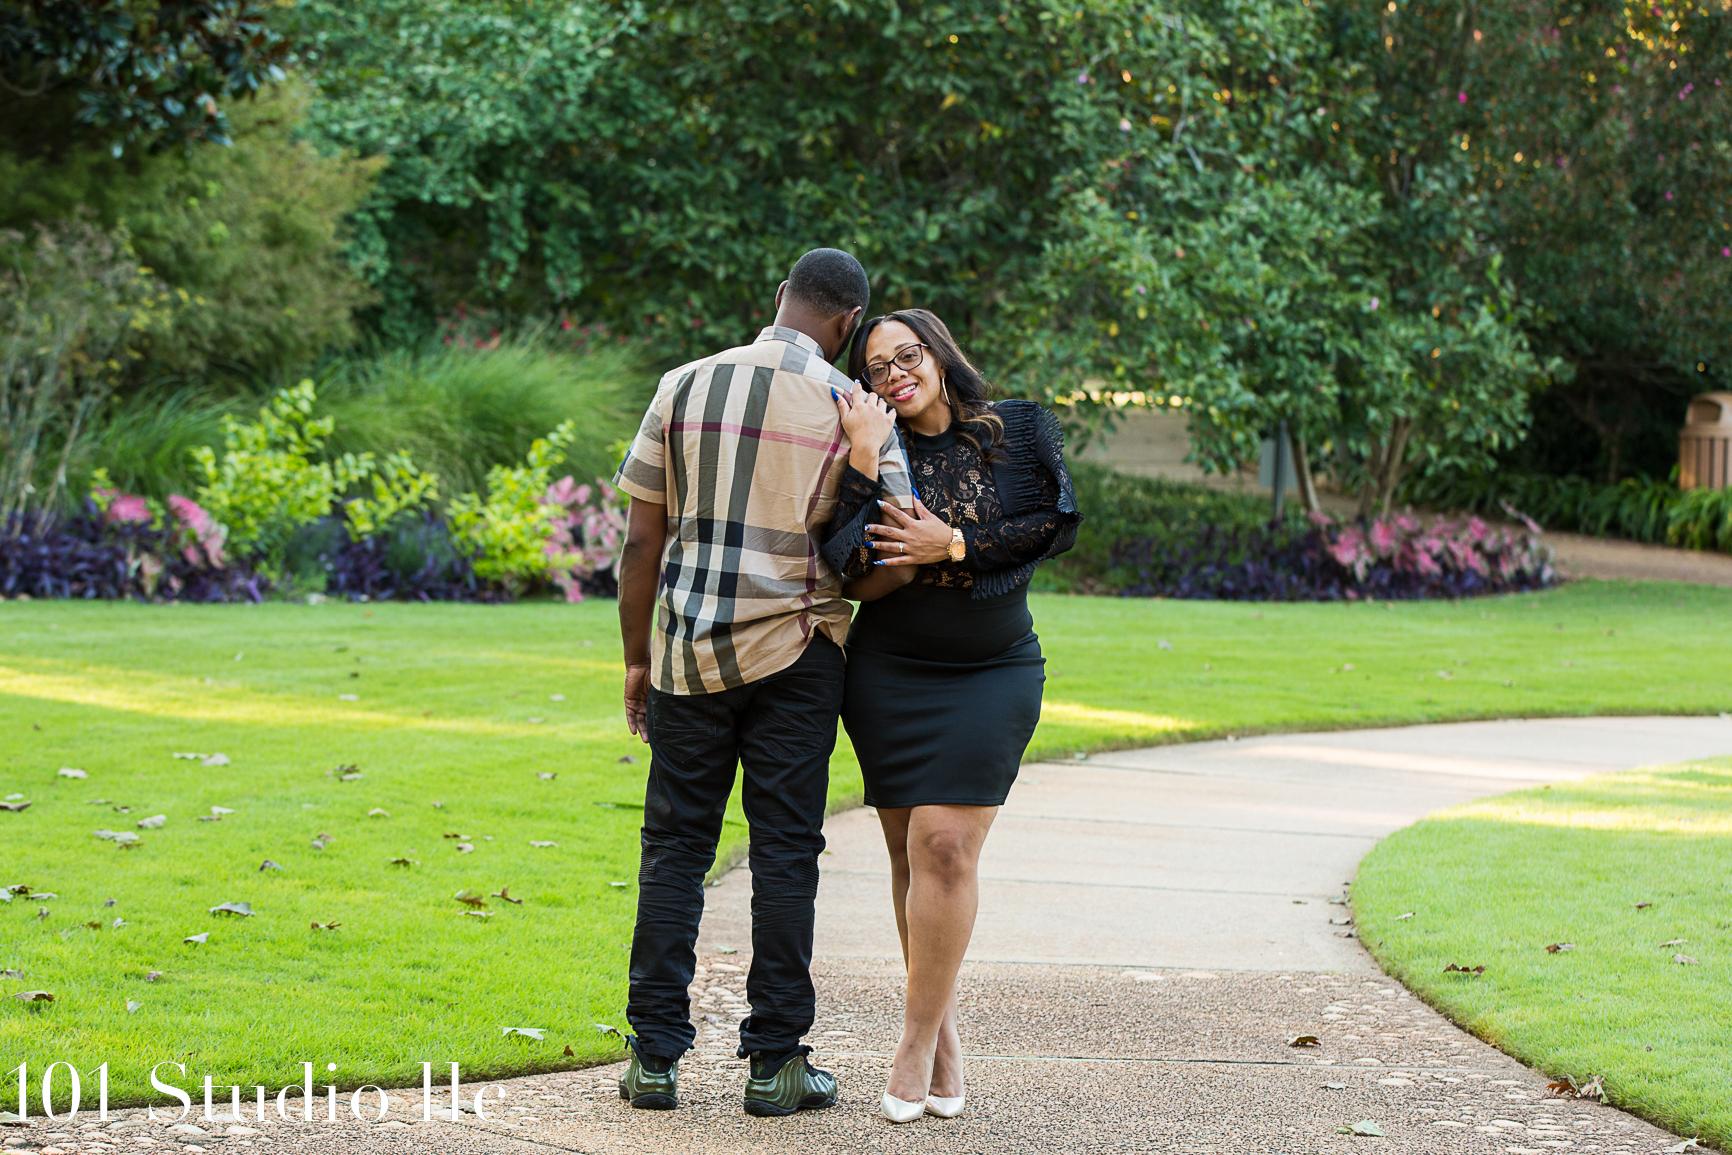 Raleigh wedding photographer - 101 studio llc -2.jpg